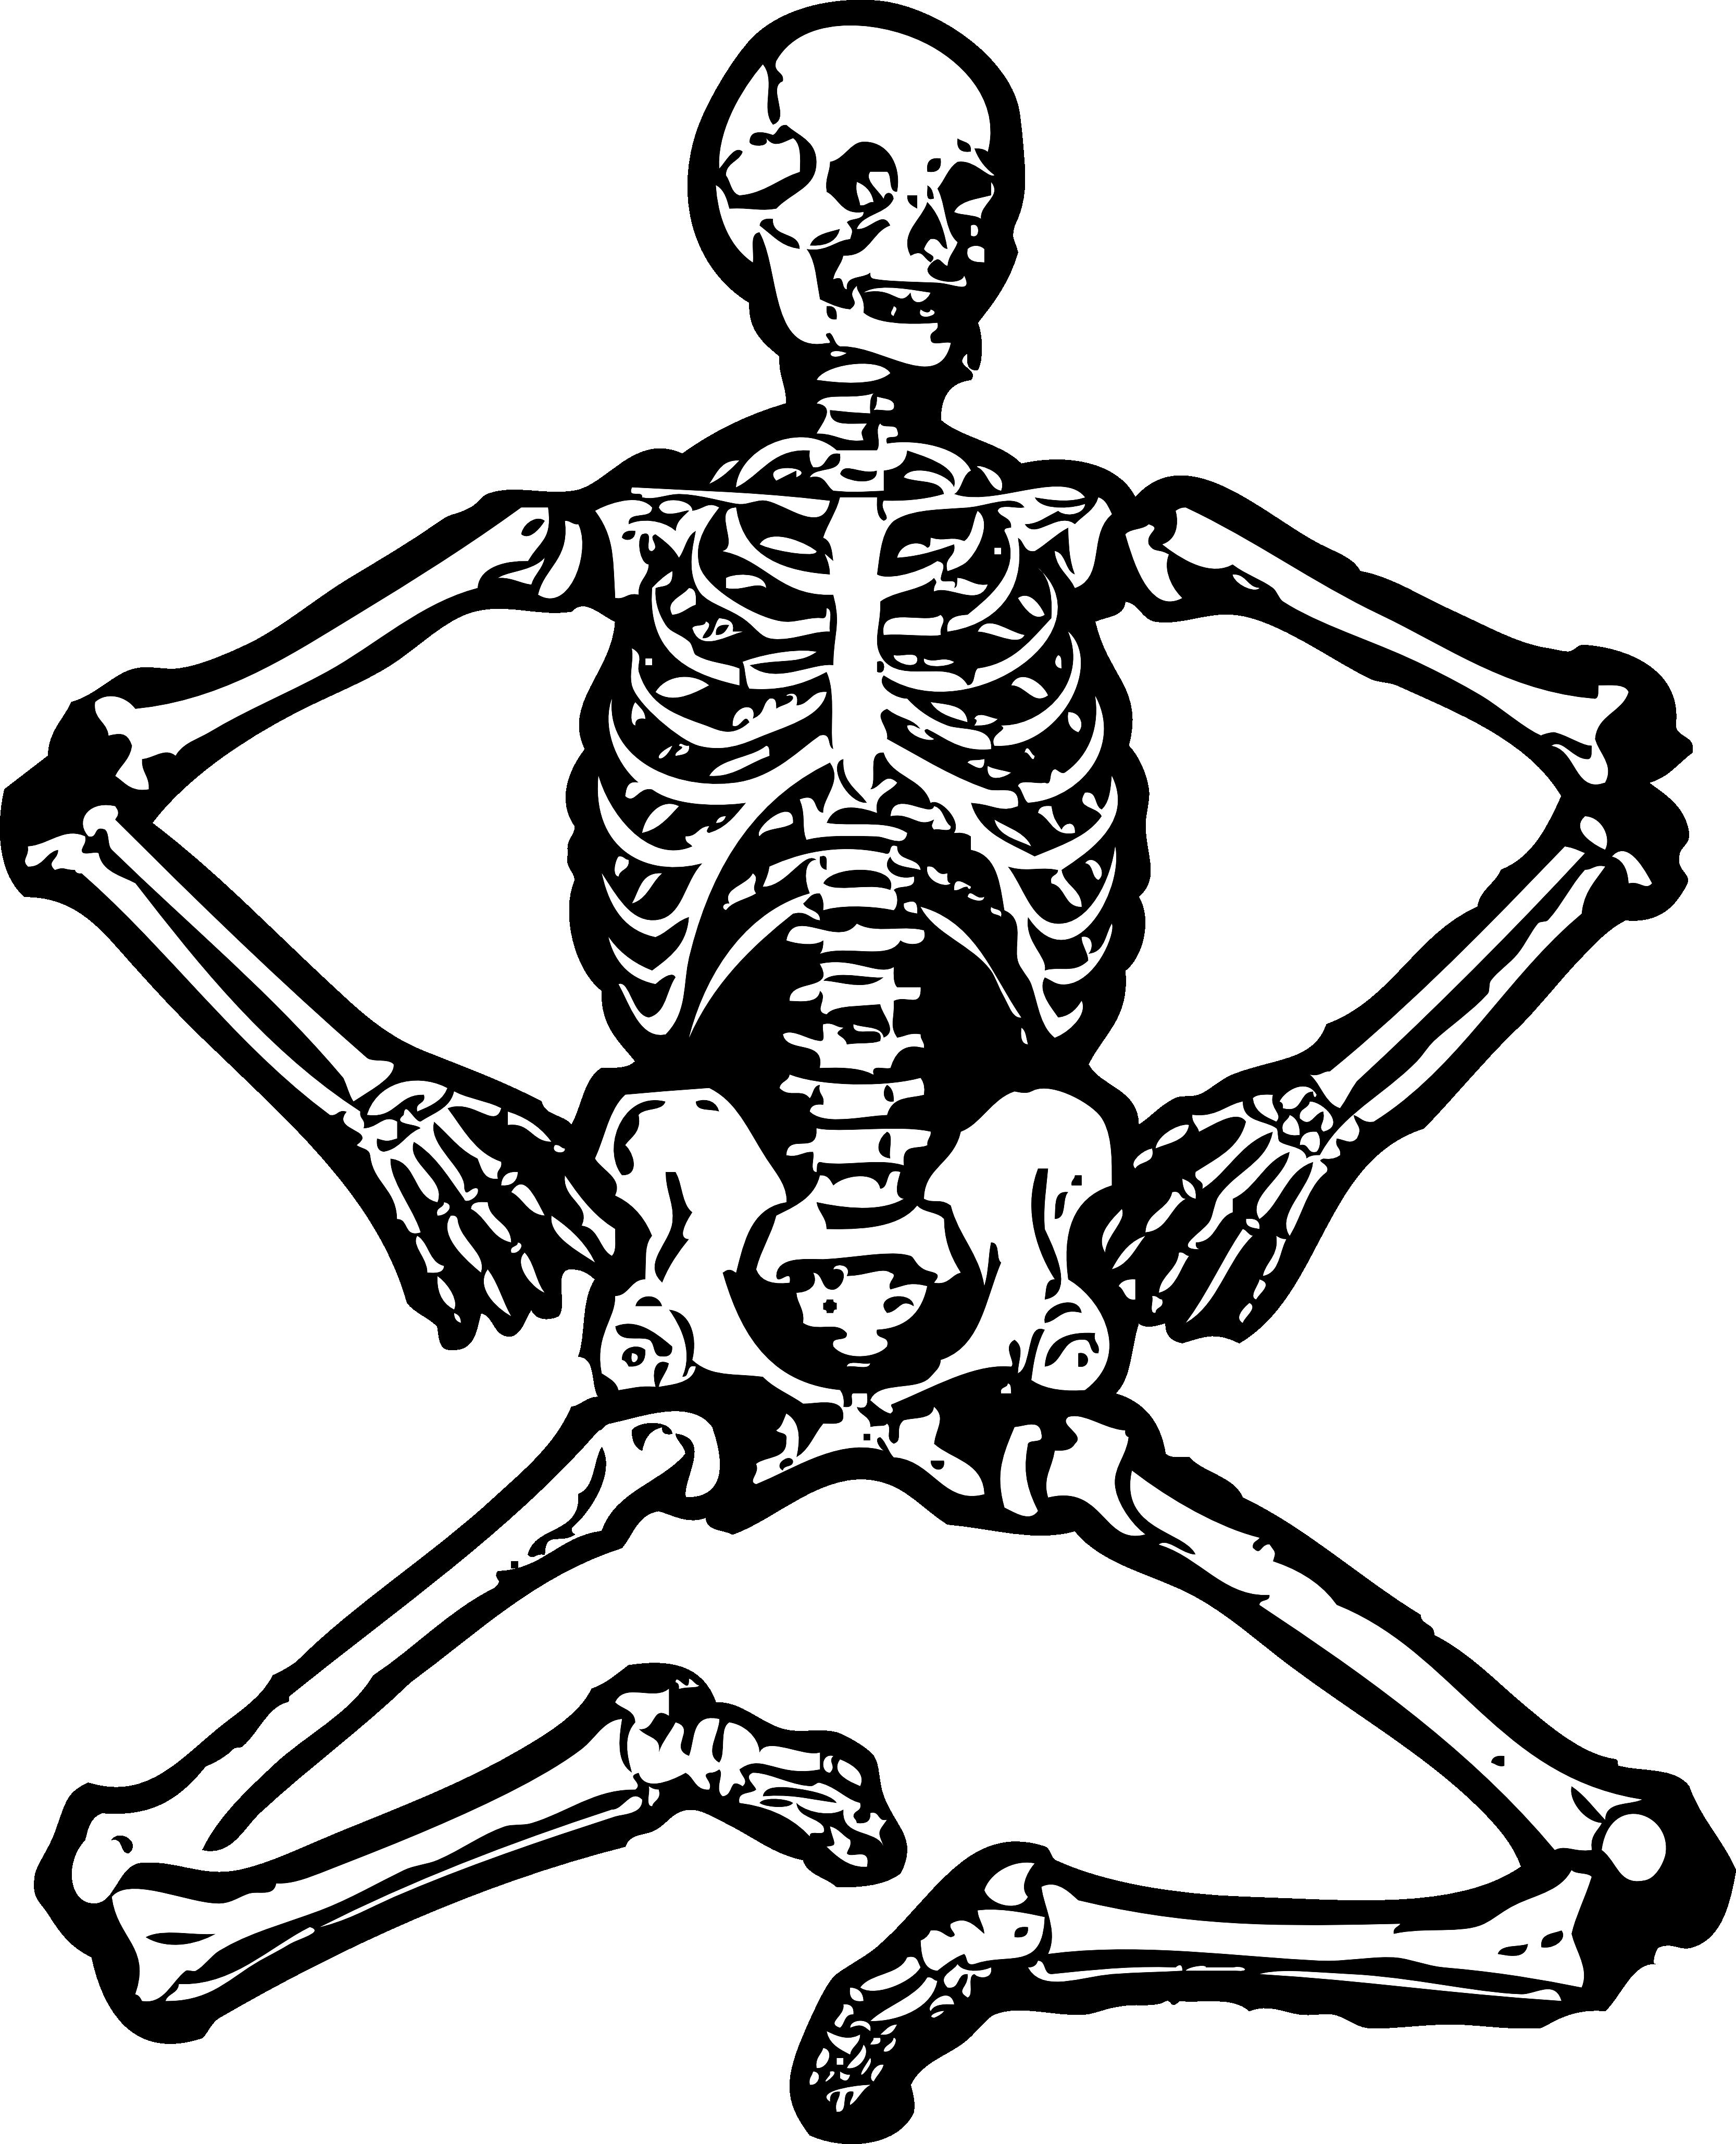 Skeleton clipart #8, Download drawings